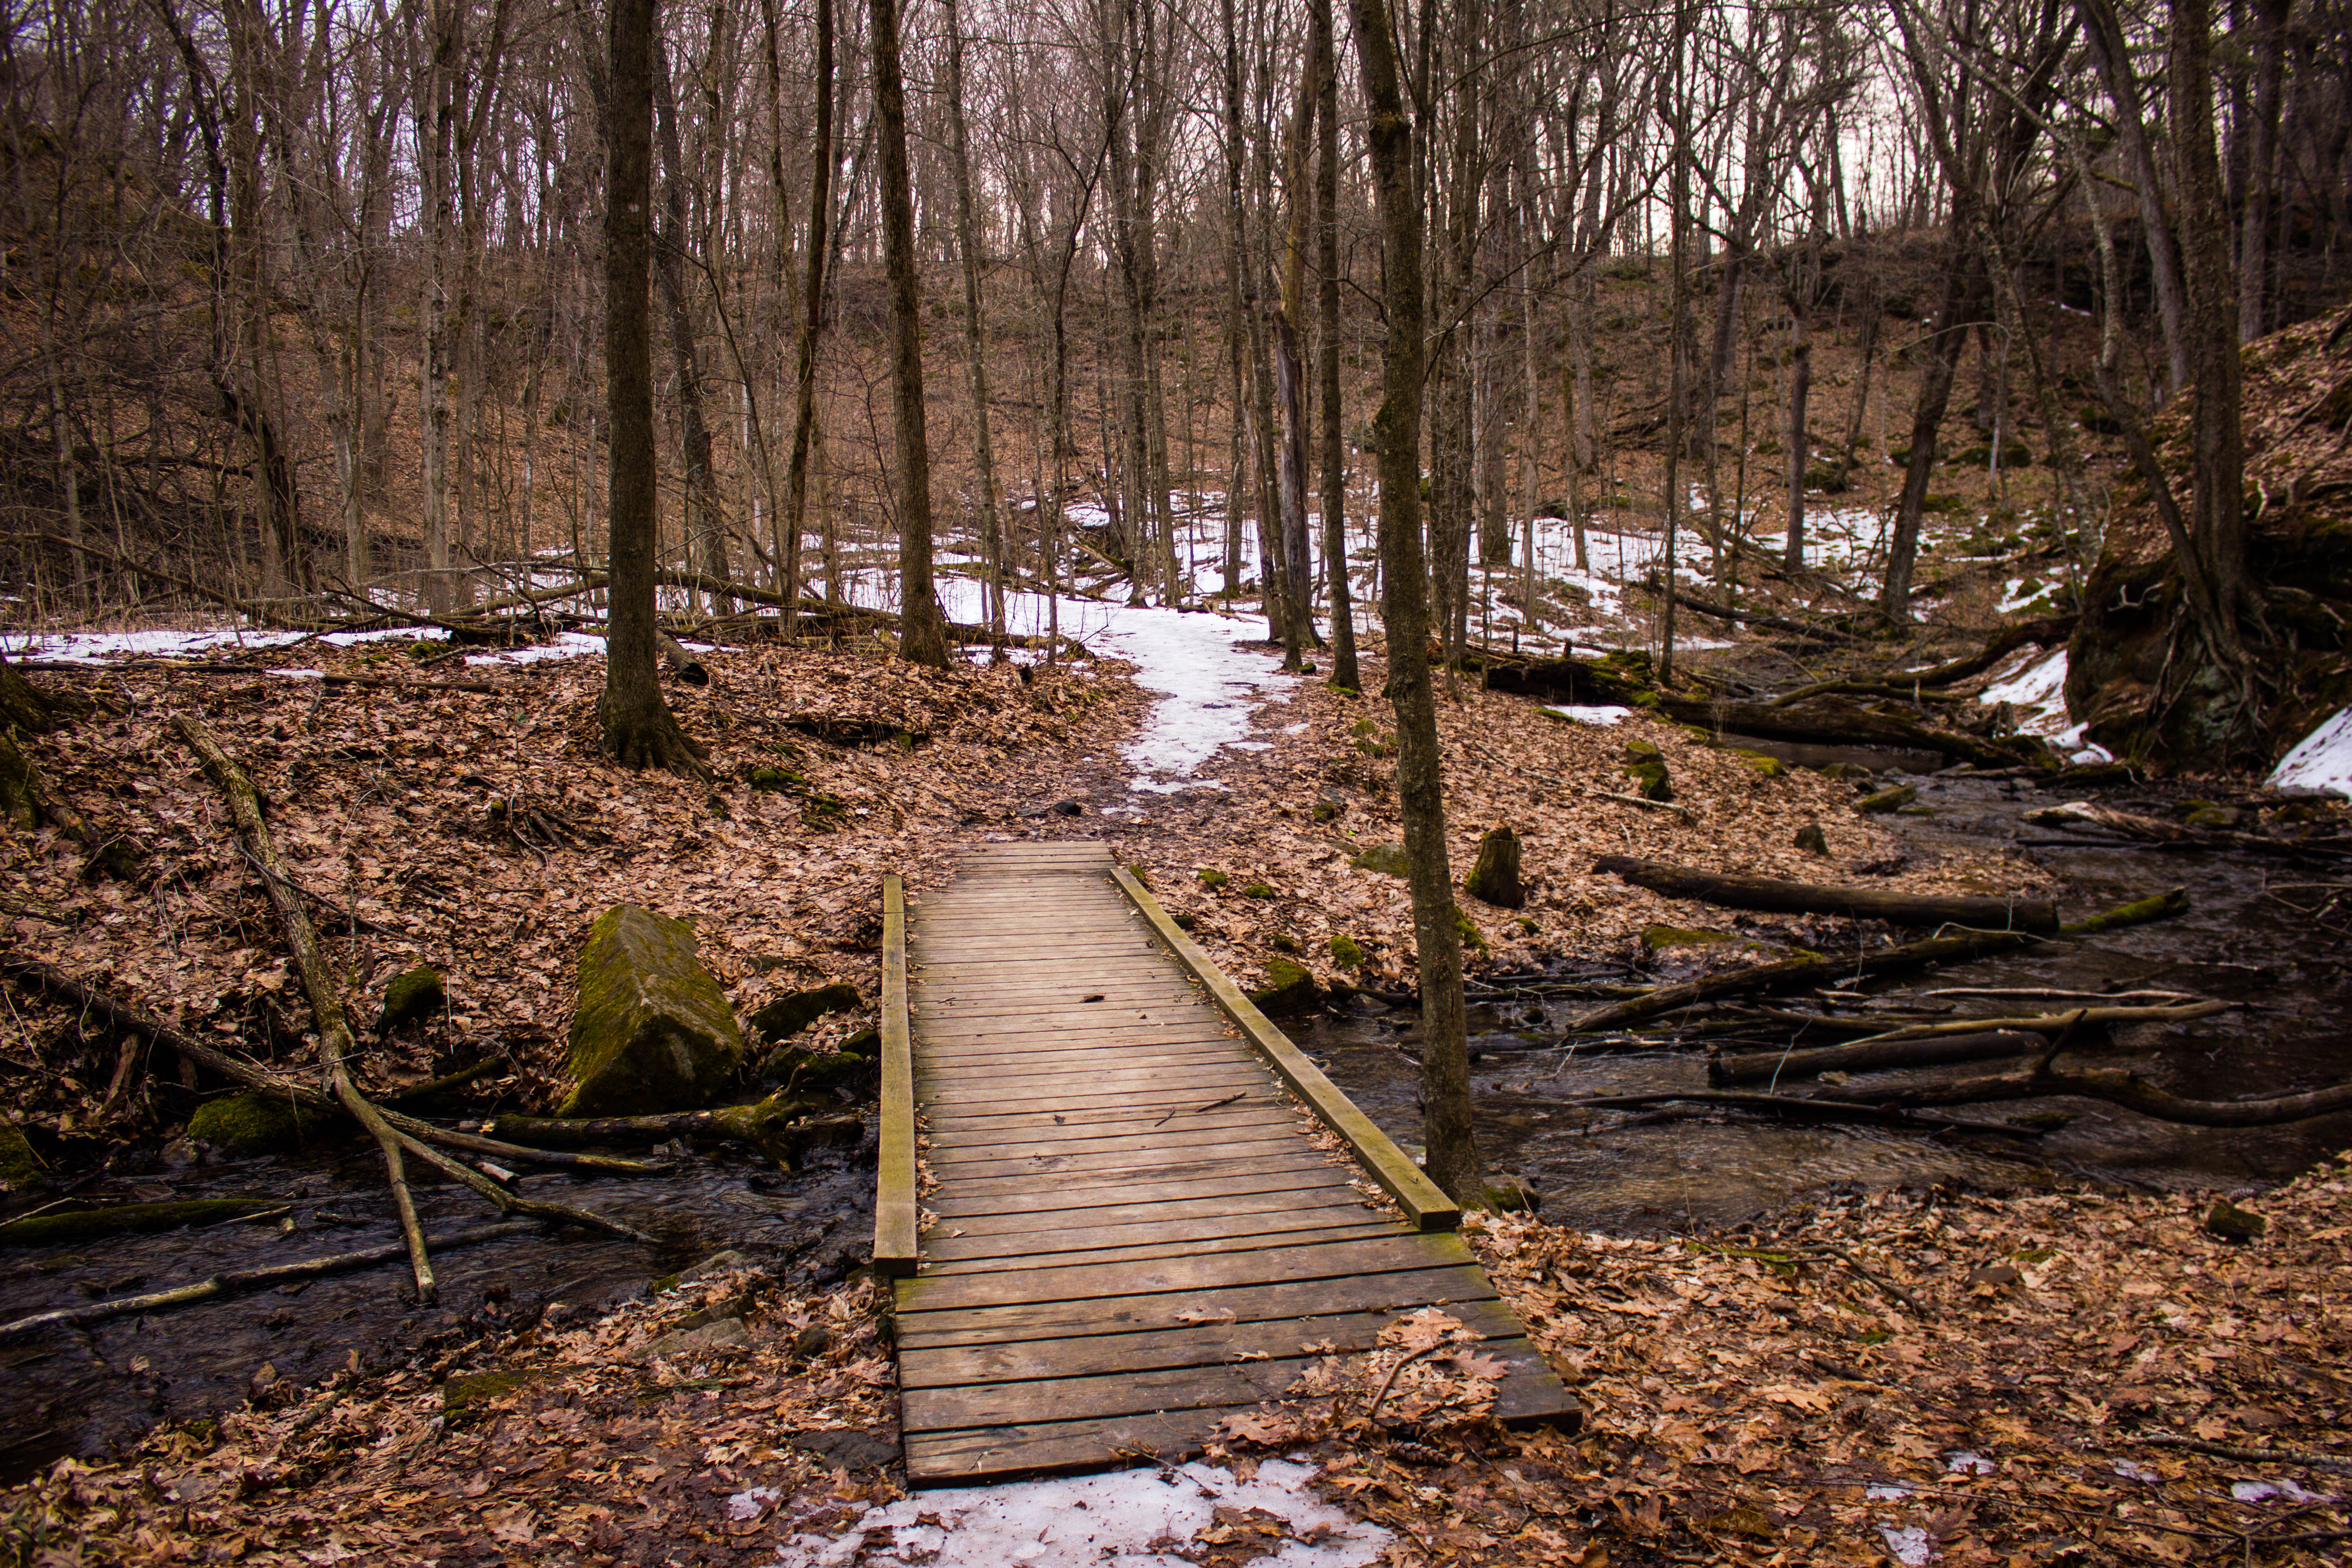 Bridge in the landscape